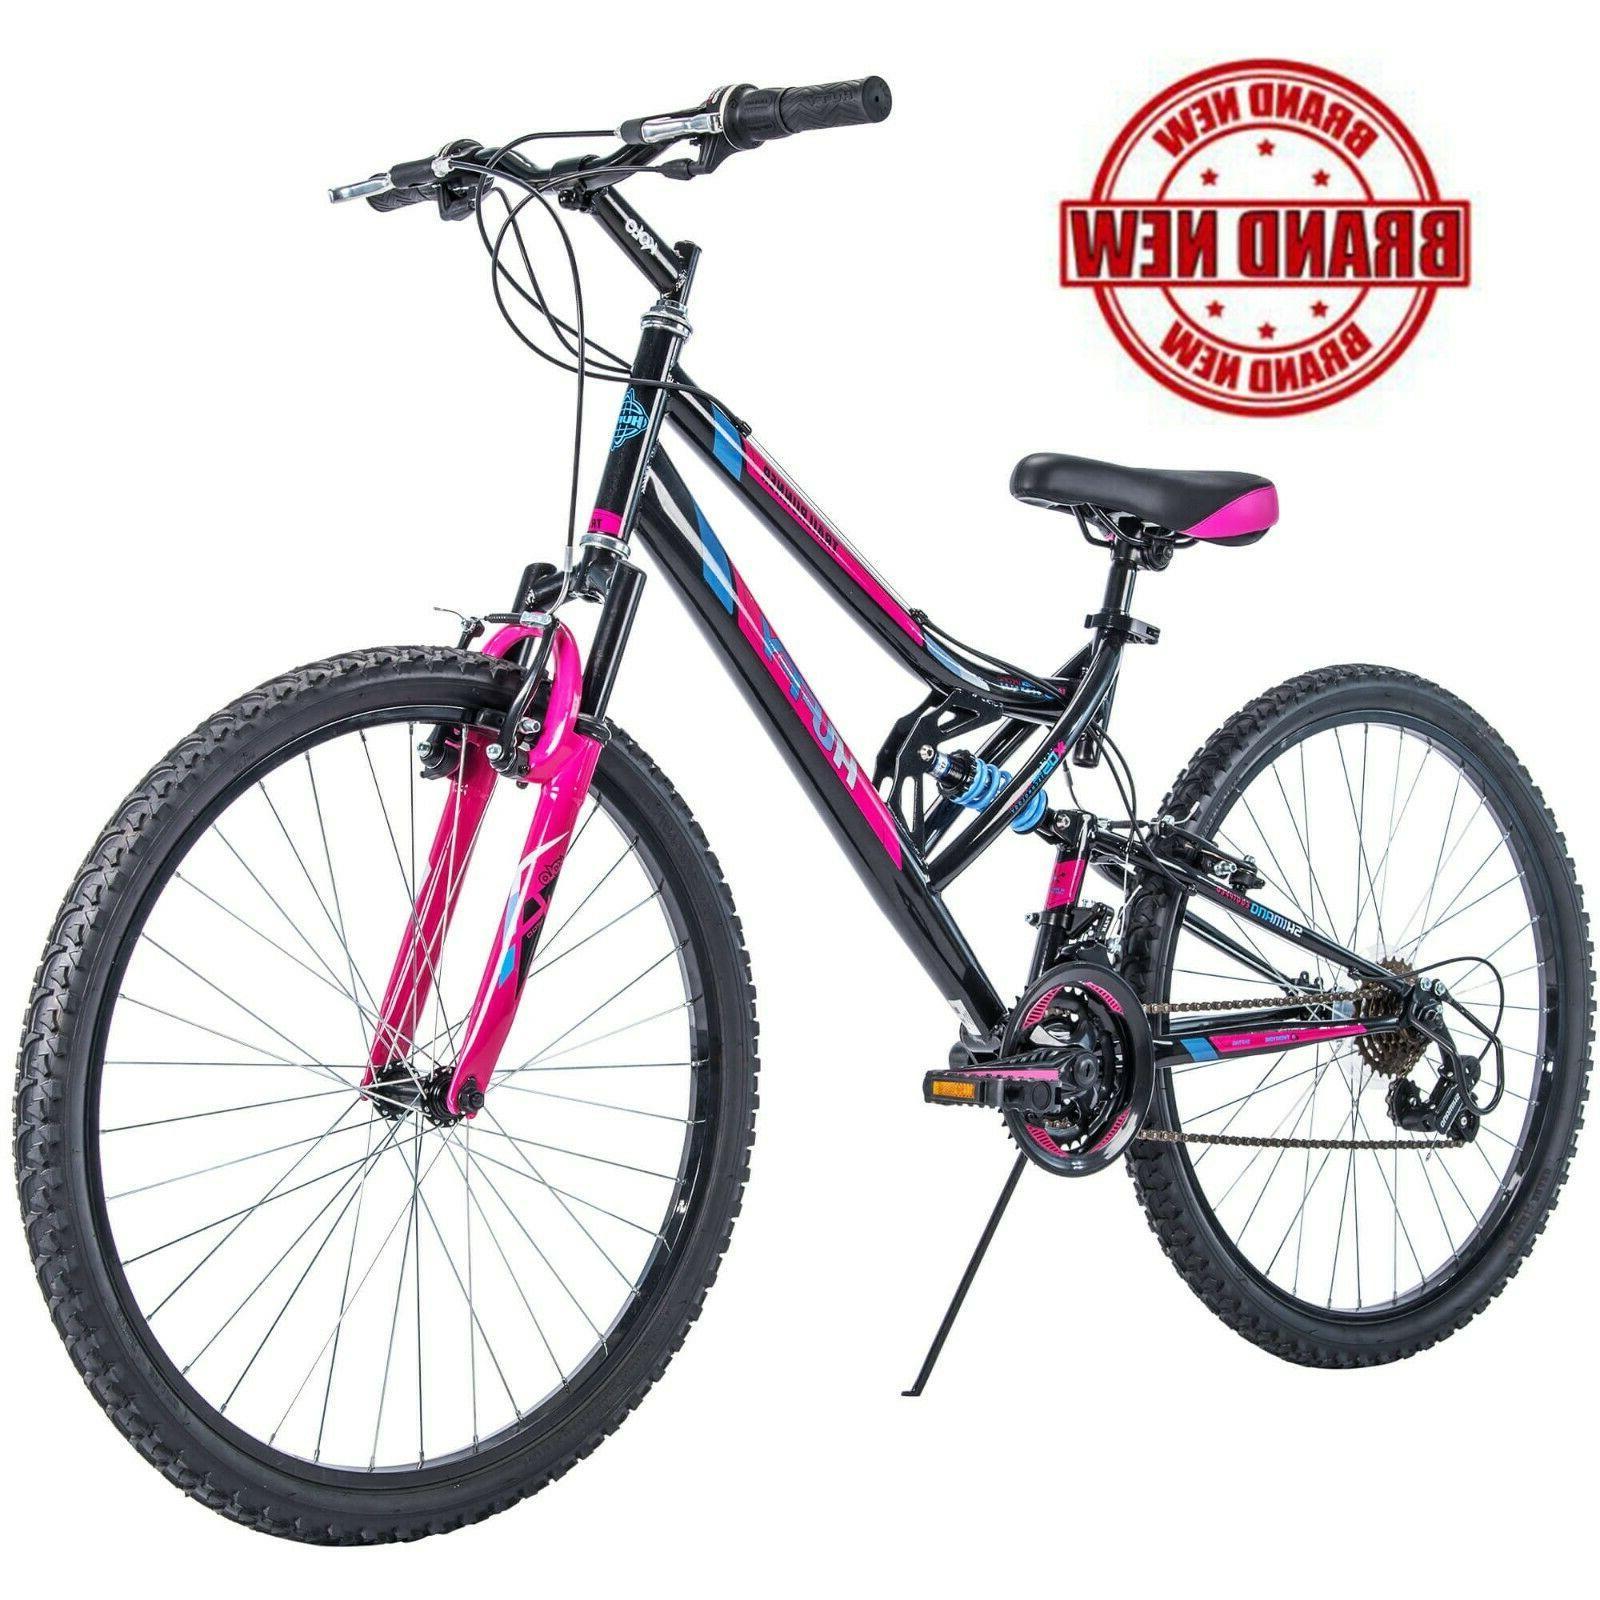 7d215df72f7 Editorial Pick Women's Mountain Bike 26